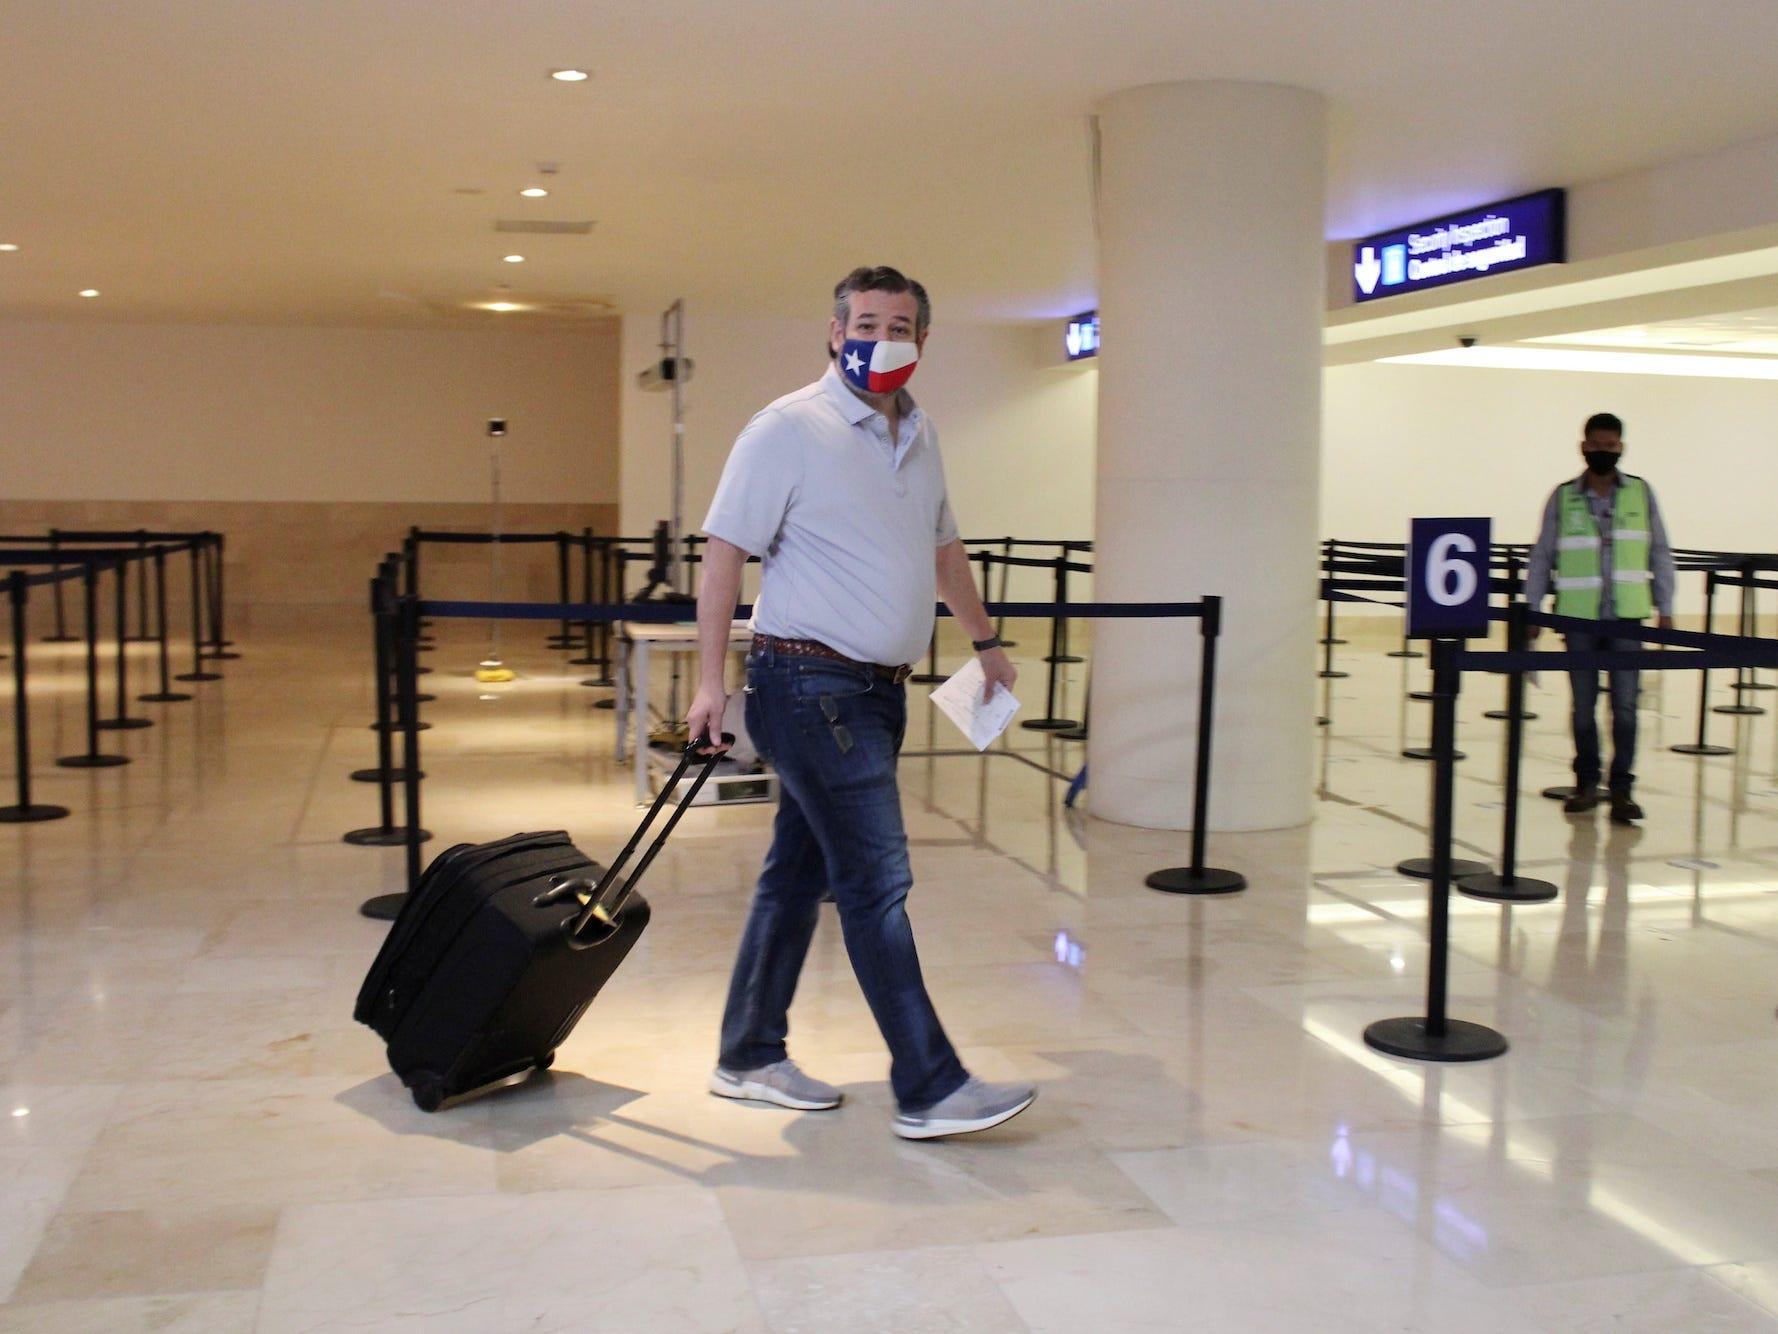 Ted Cruz Cancun 1.JPG